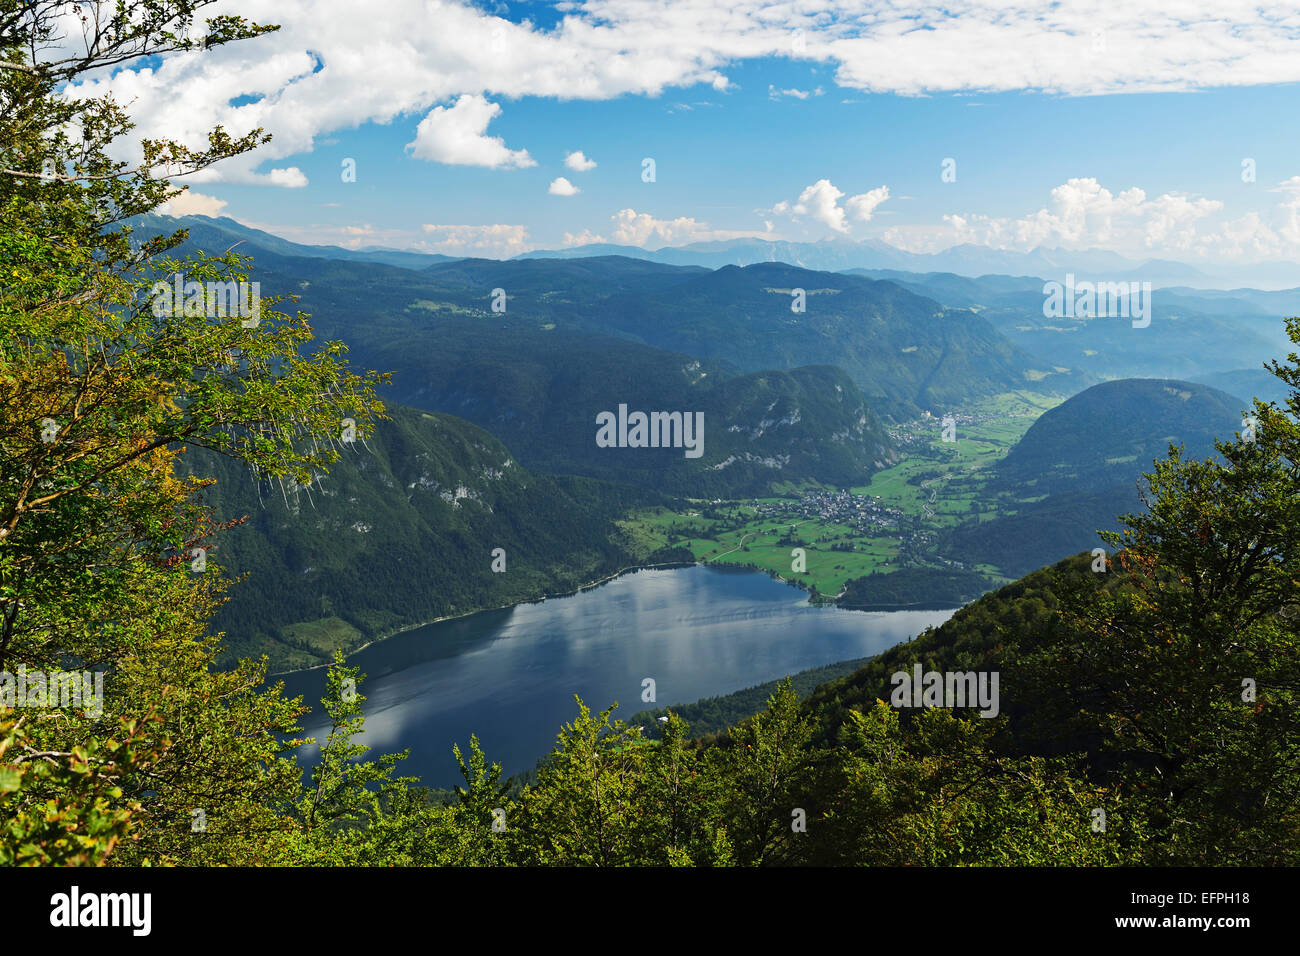 Lac de Bohinj, Bohimj vallée, Alpes Juliennes, parc national du Triglav, en Slovénie, Europe Photo Stock